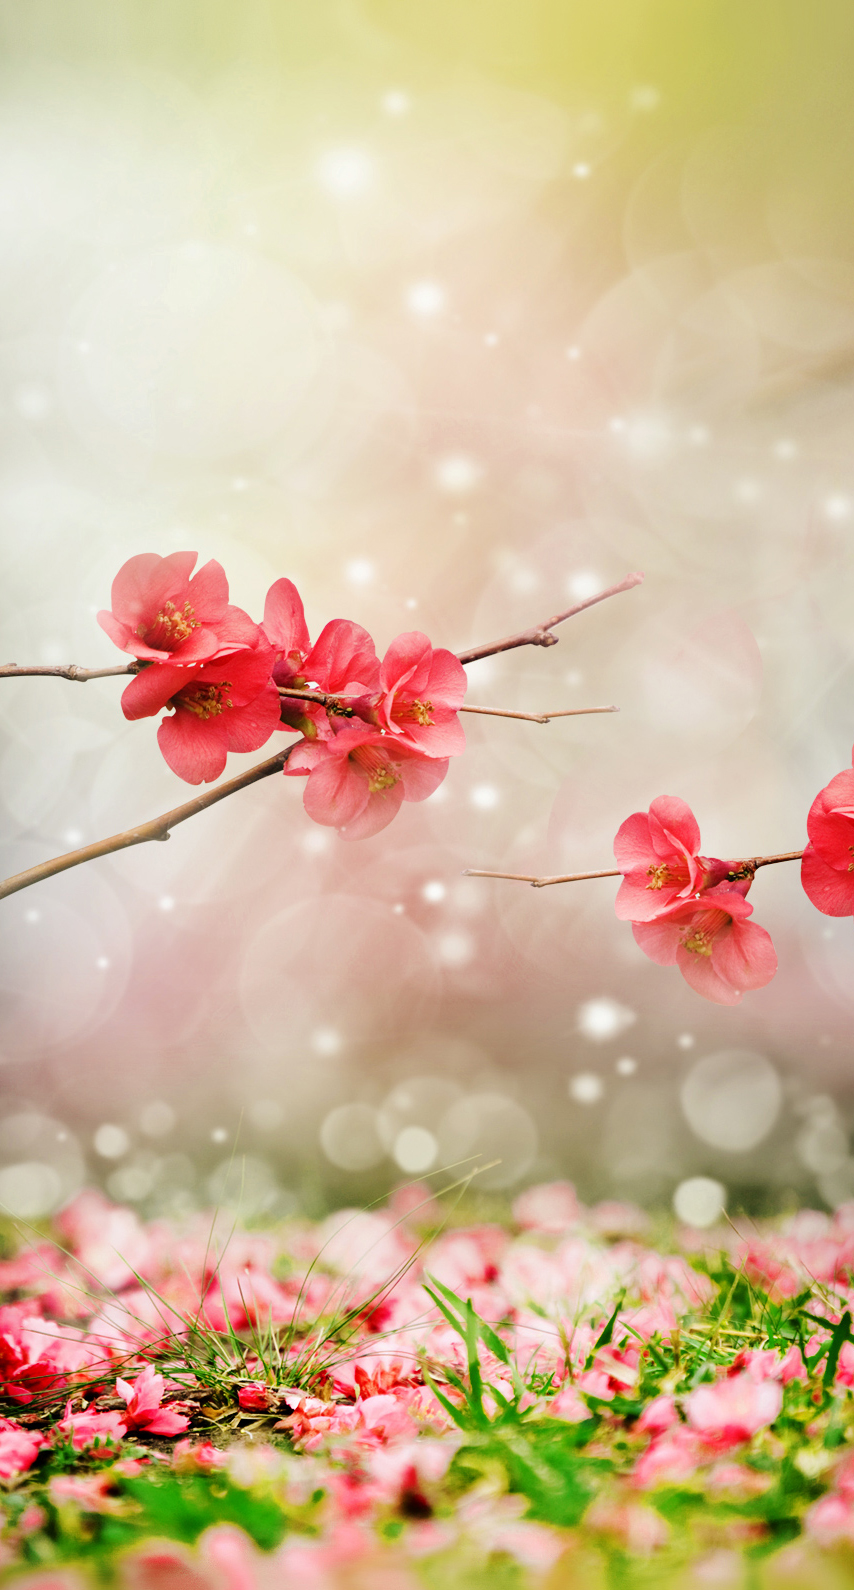 tree, branch, field, bright, fantasy, floral, celebration, art, summer, graphic, park